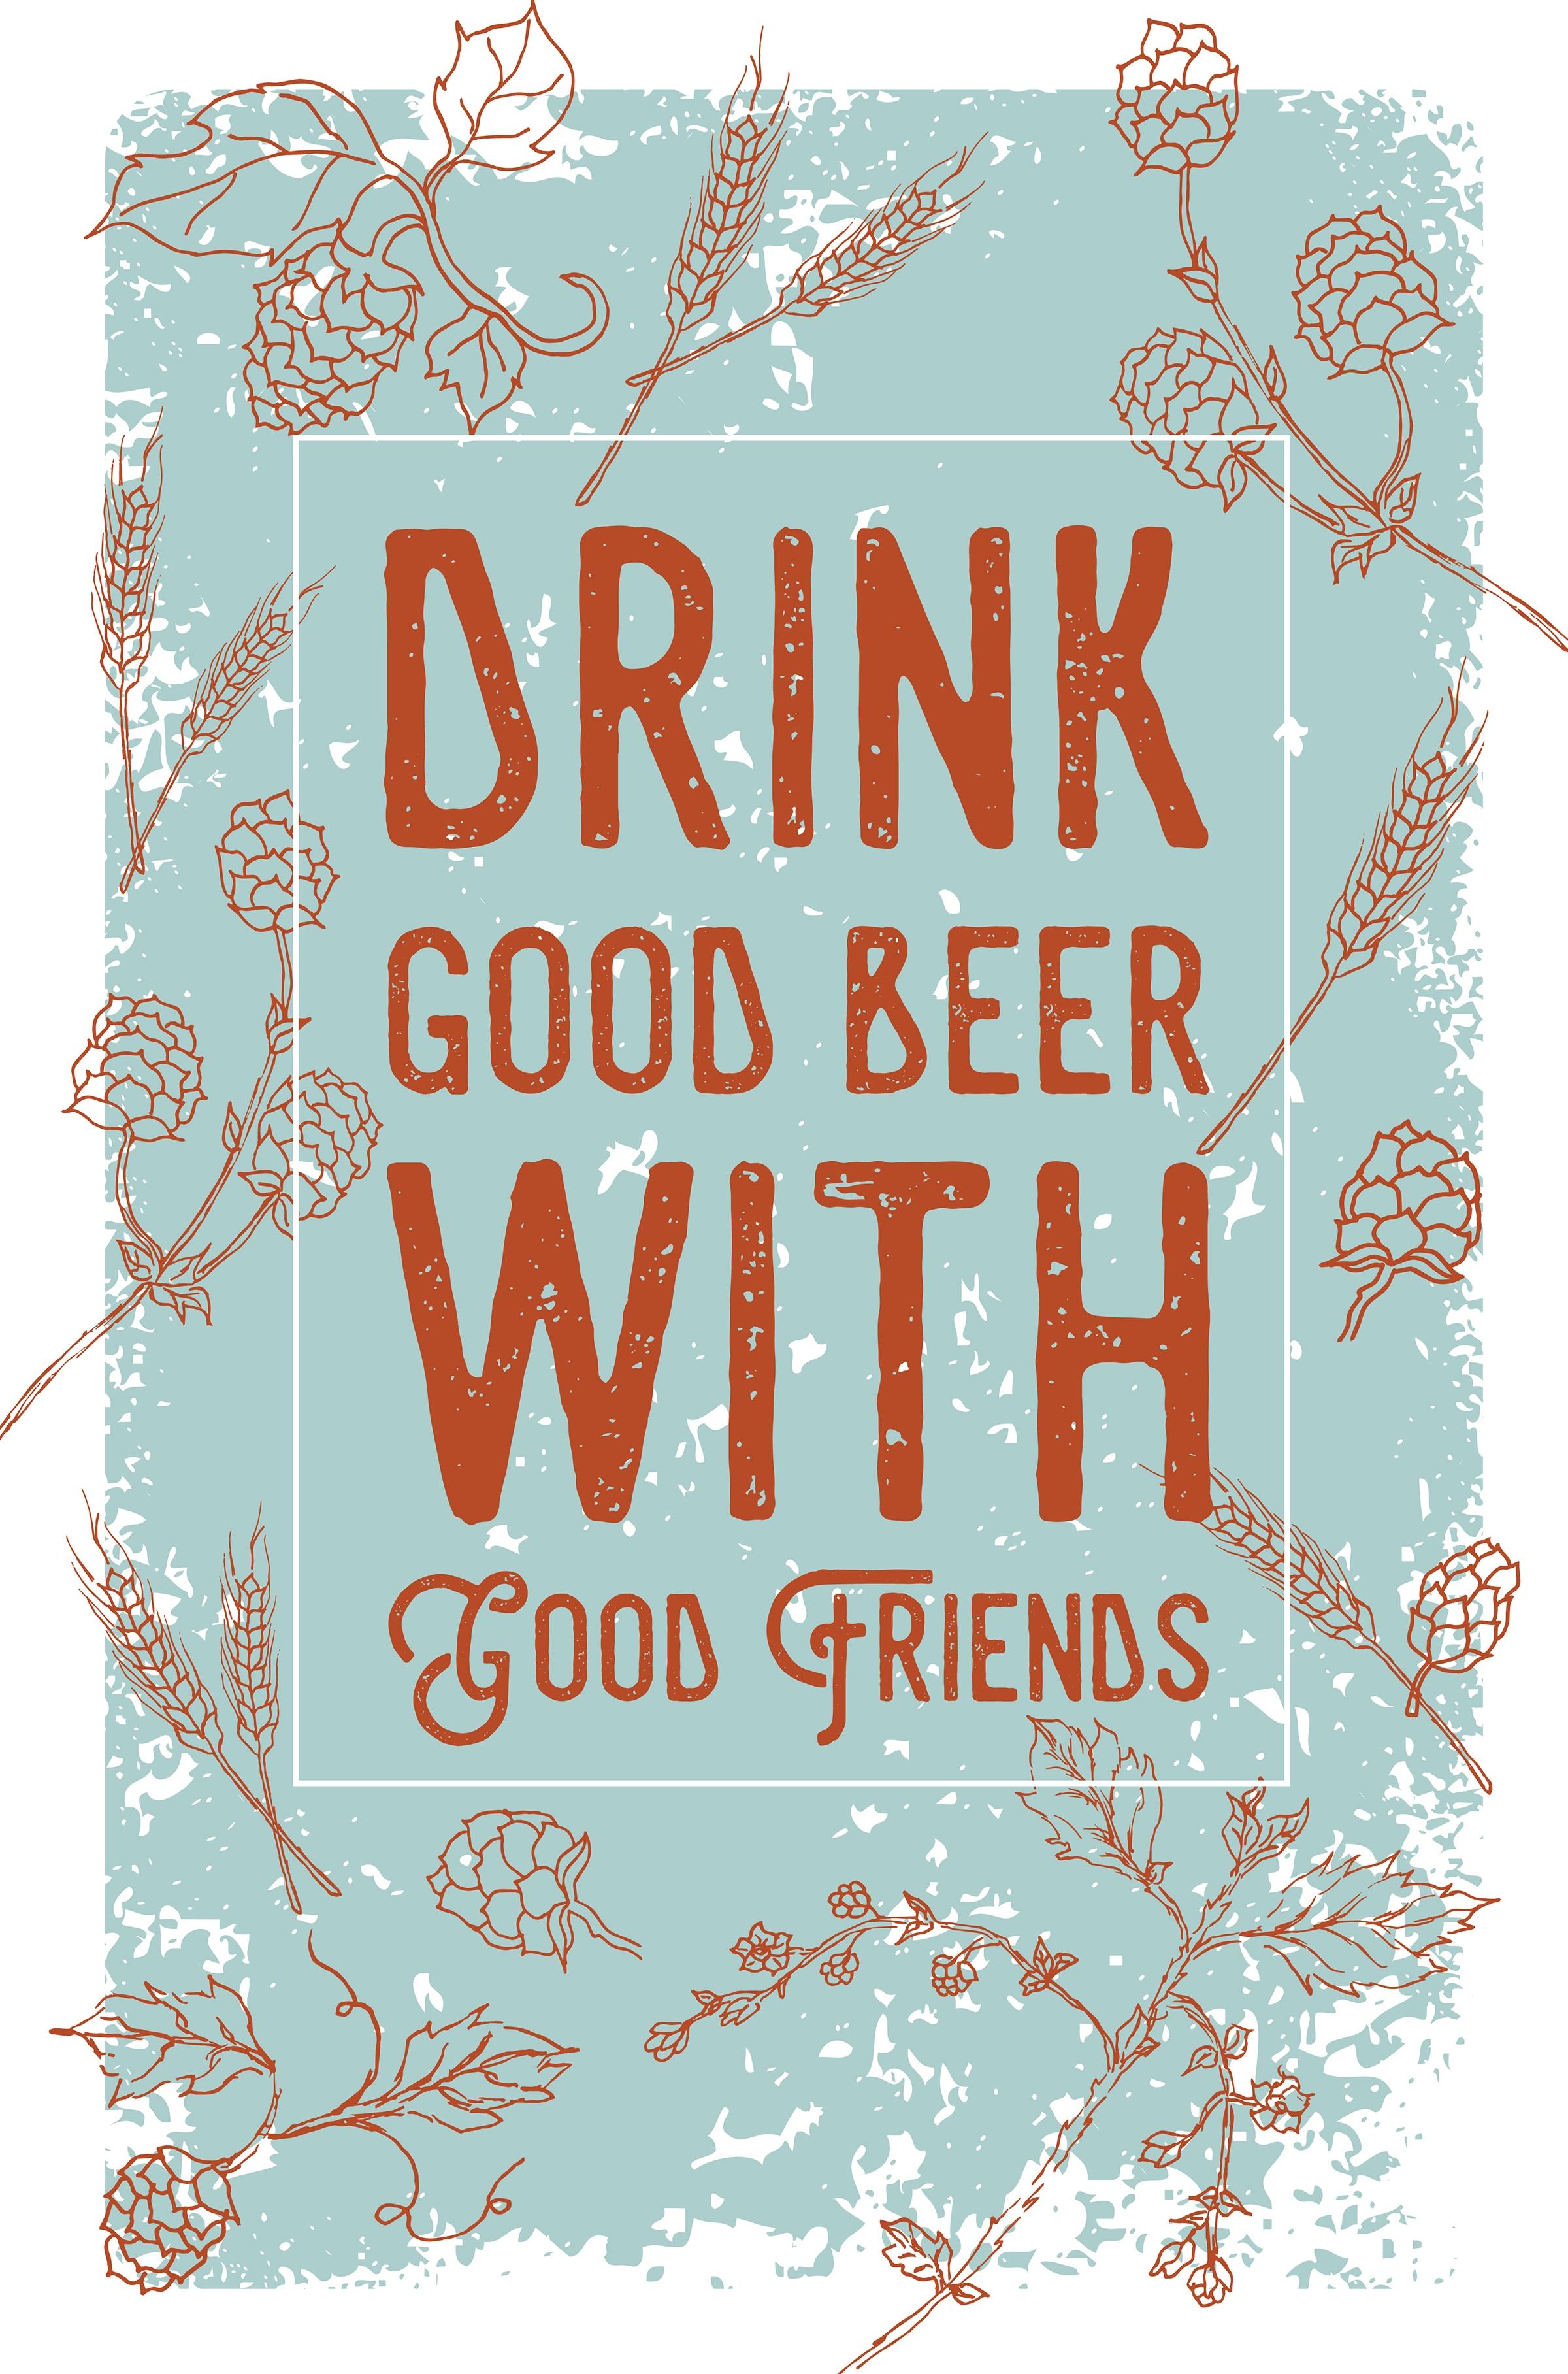 Craft Beer Poster-03.jpg